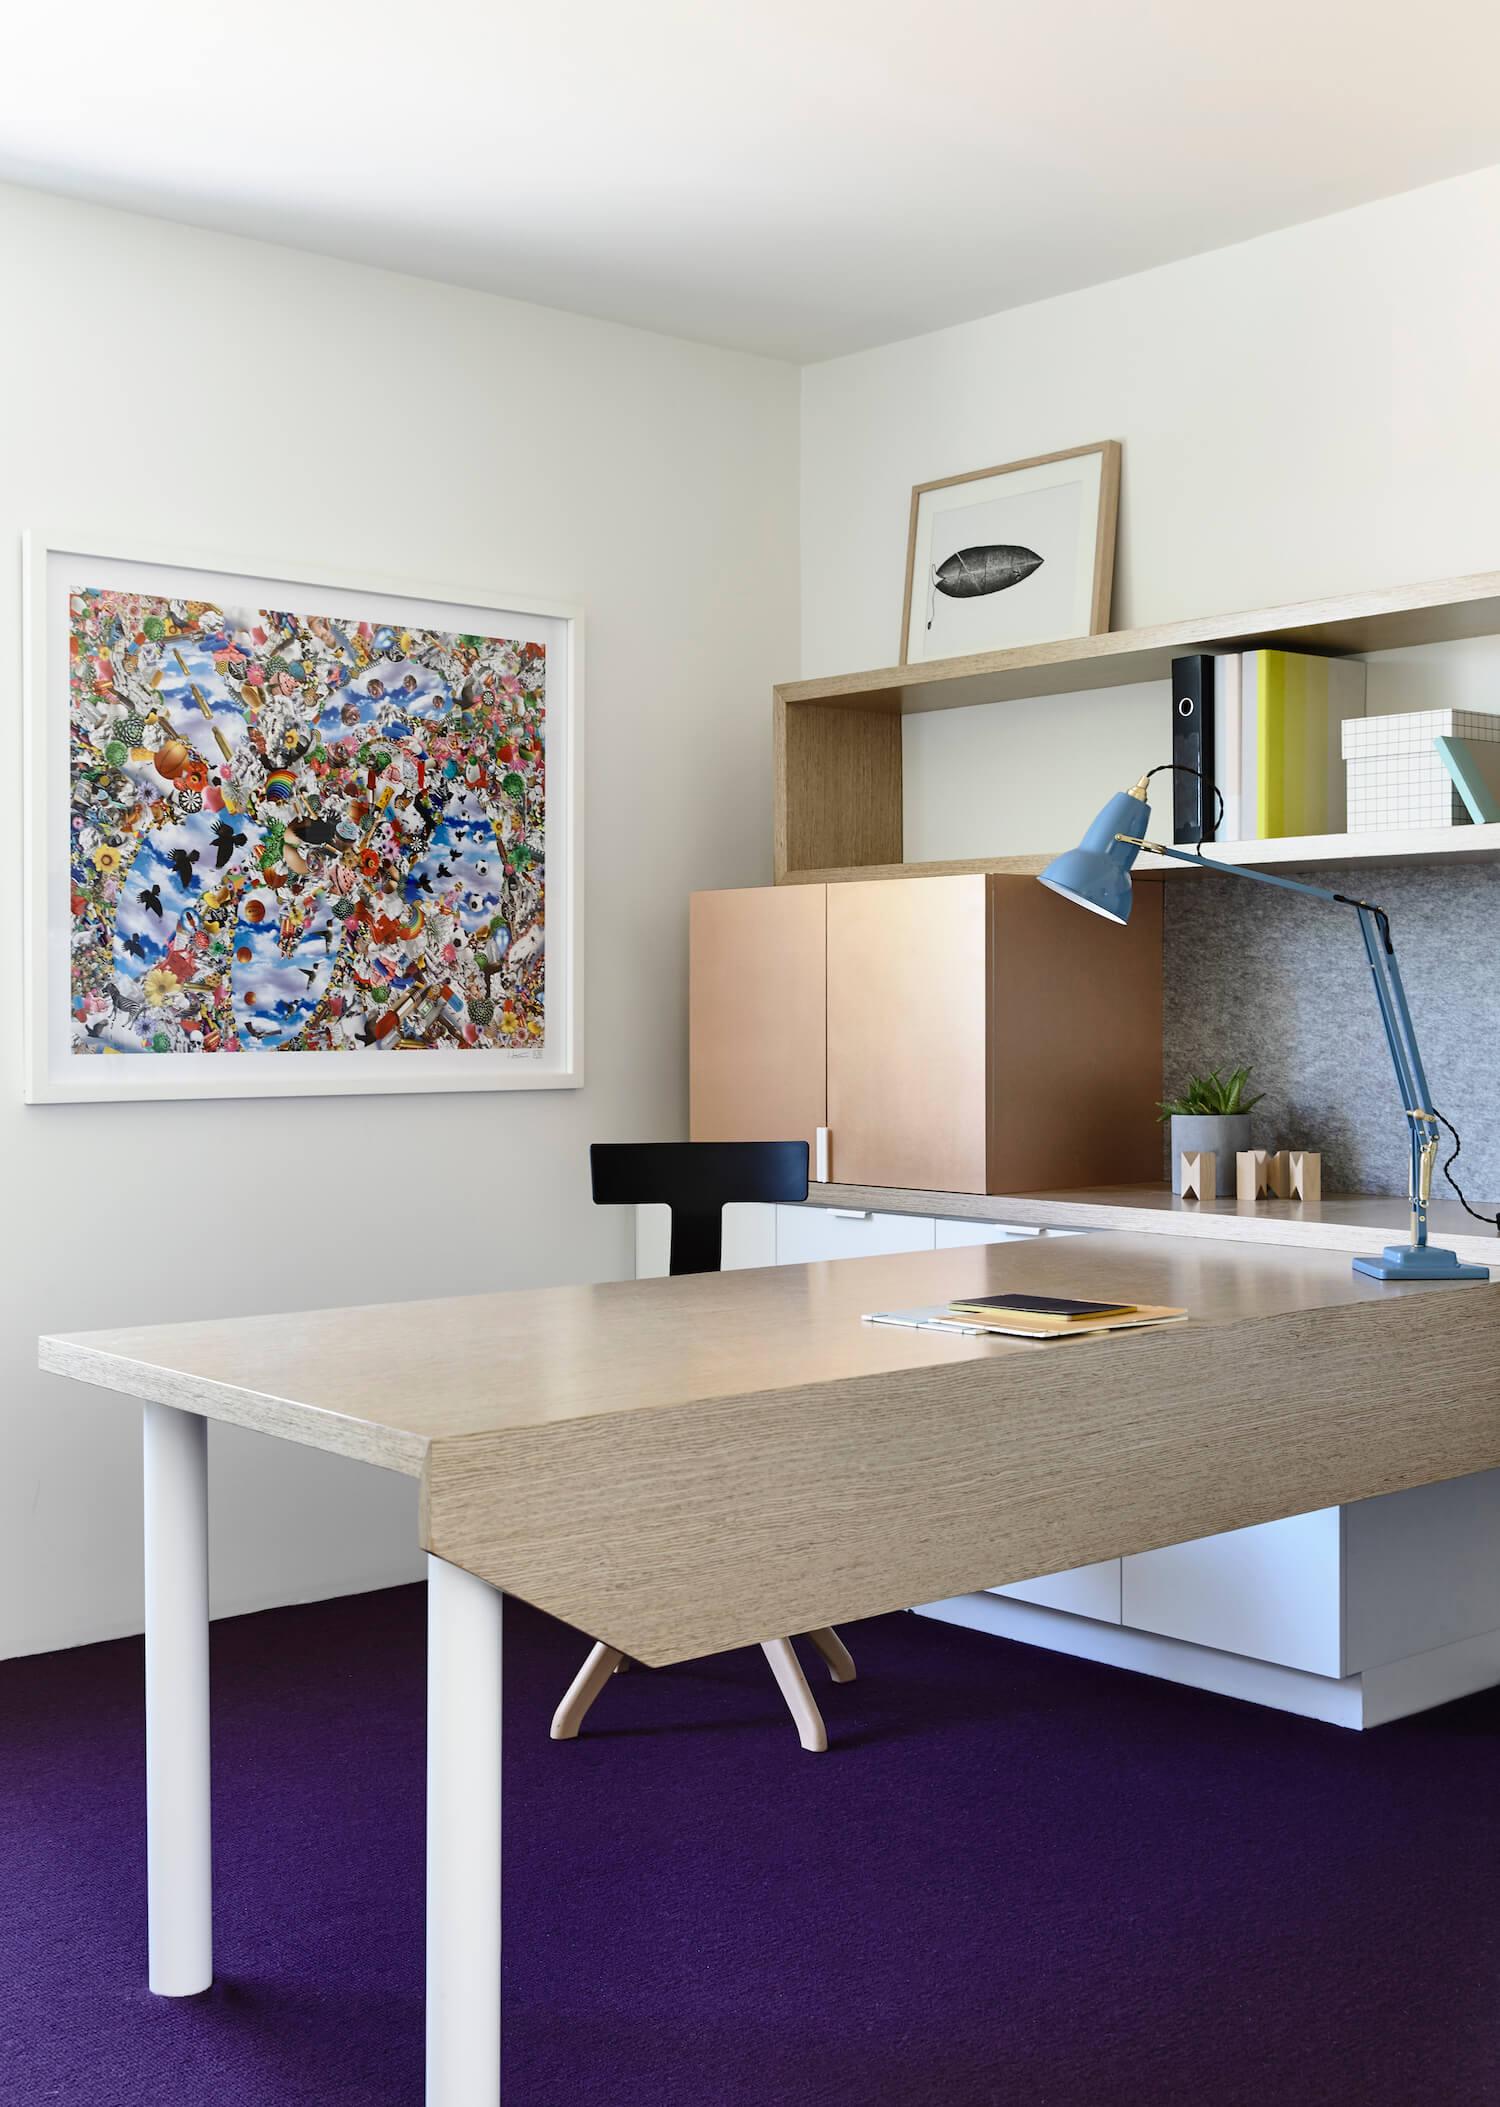 est living designer interview mardi doherty design studio hawthorn res derek swalwell 5